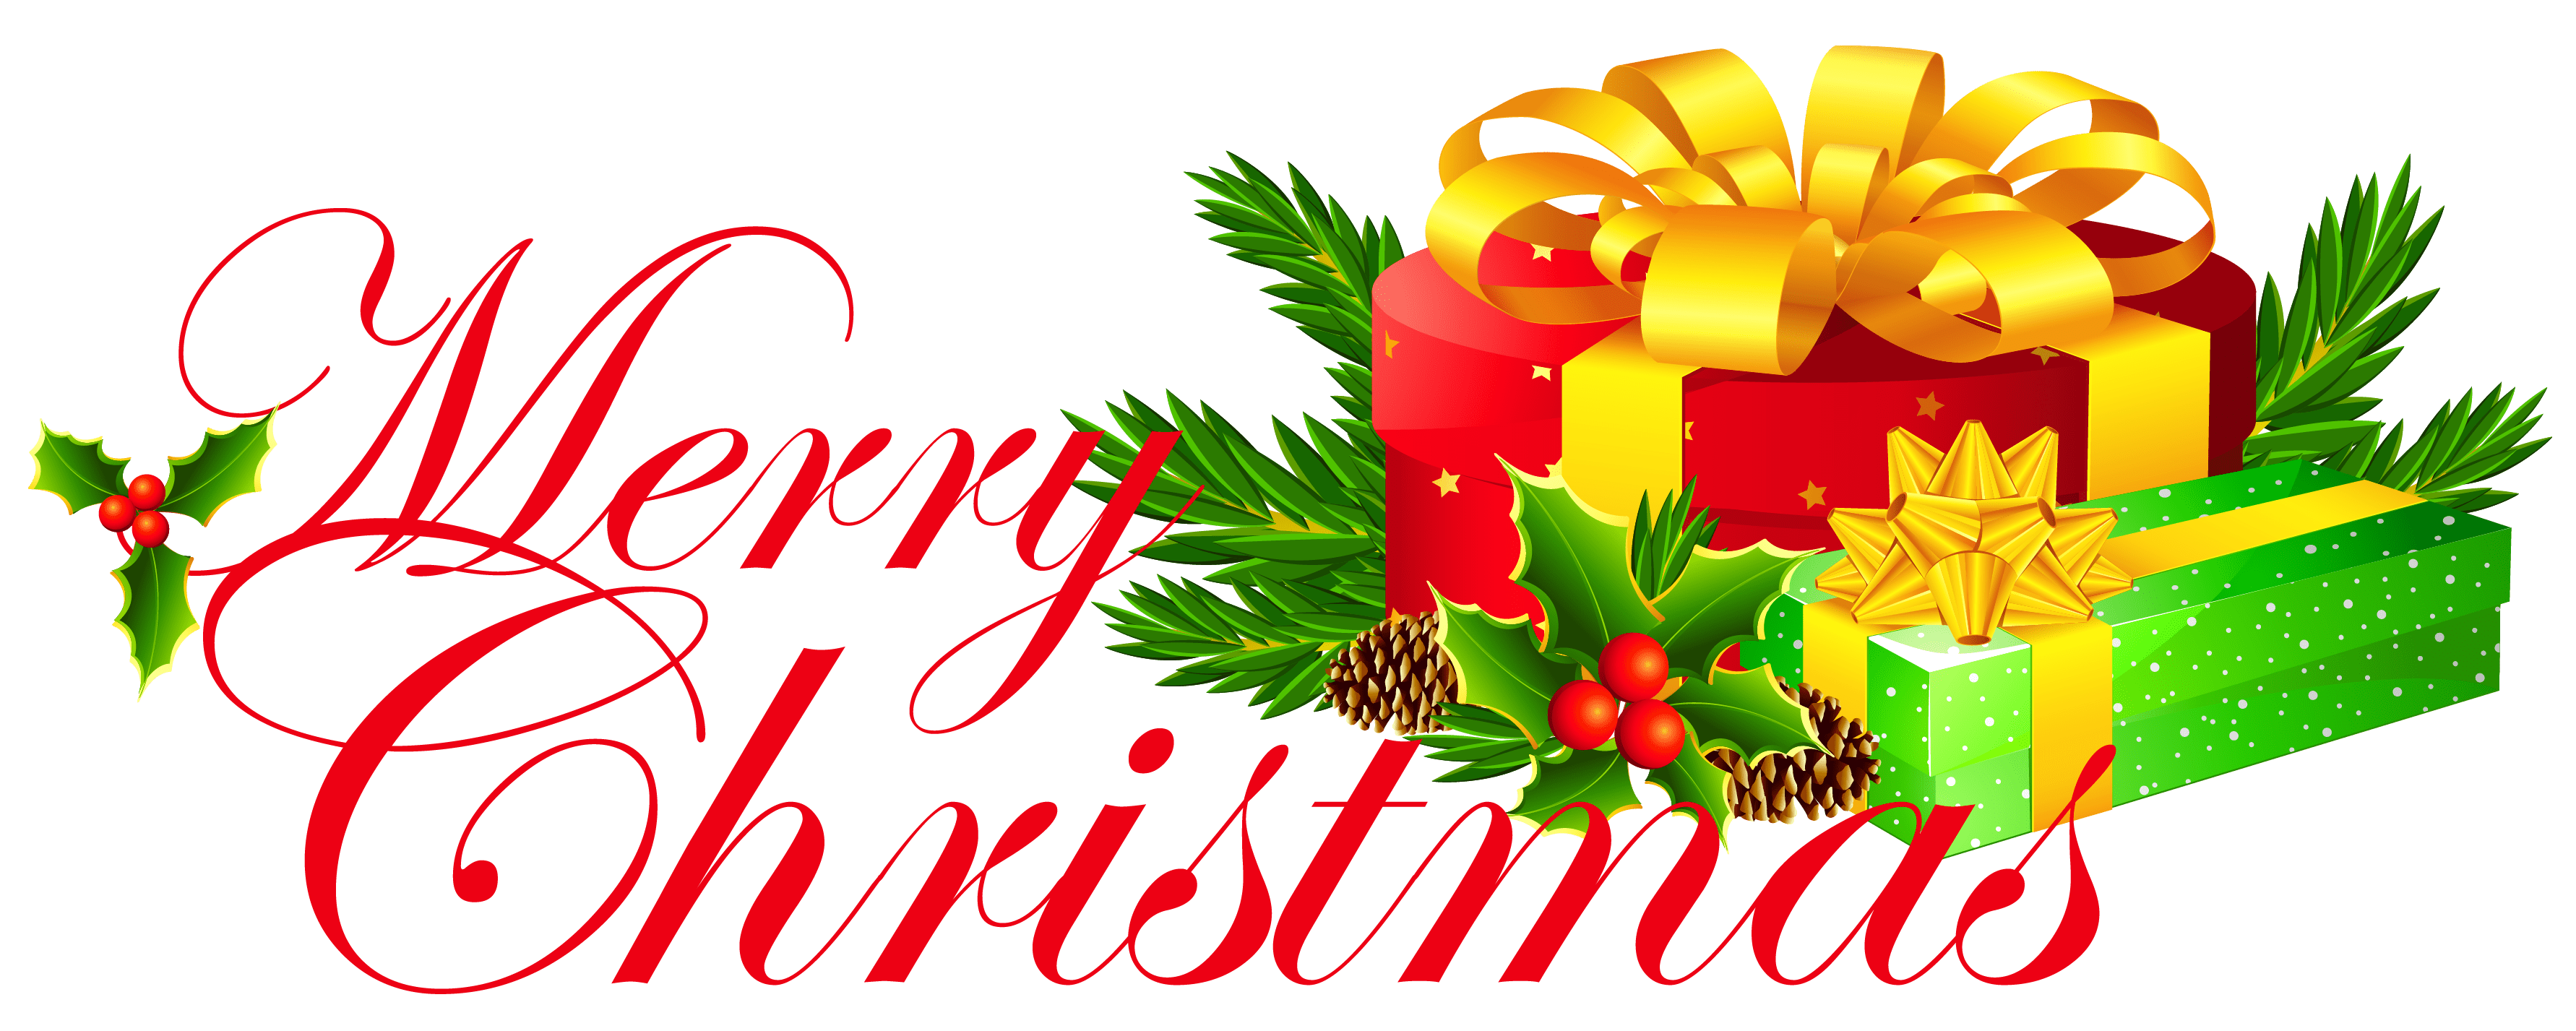 Merry christmas eve clipart 2 » Clipart Portal.